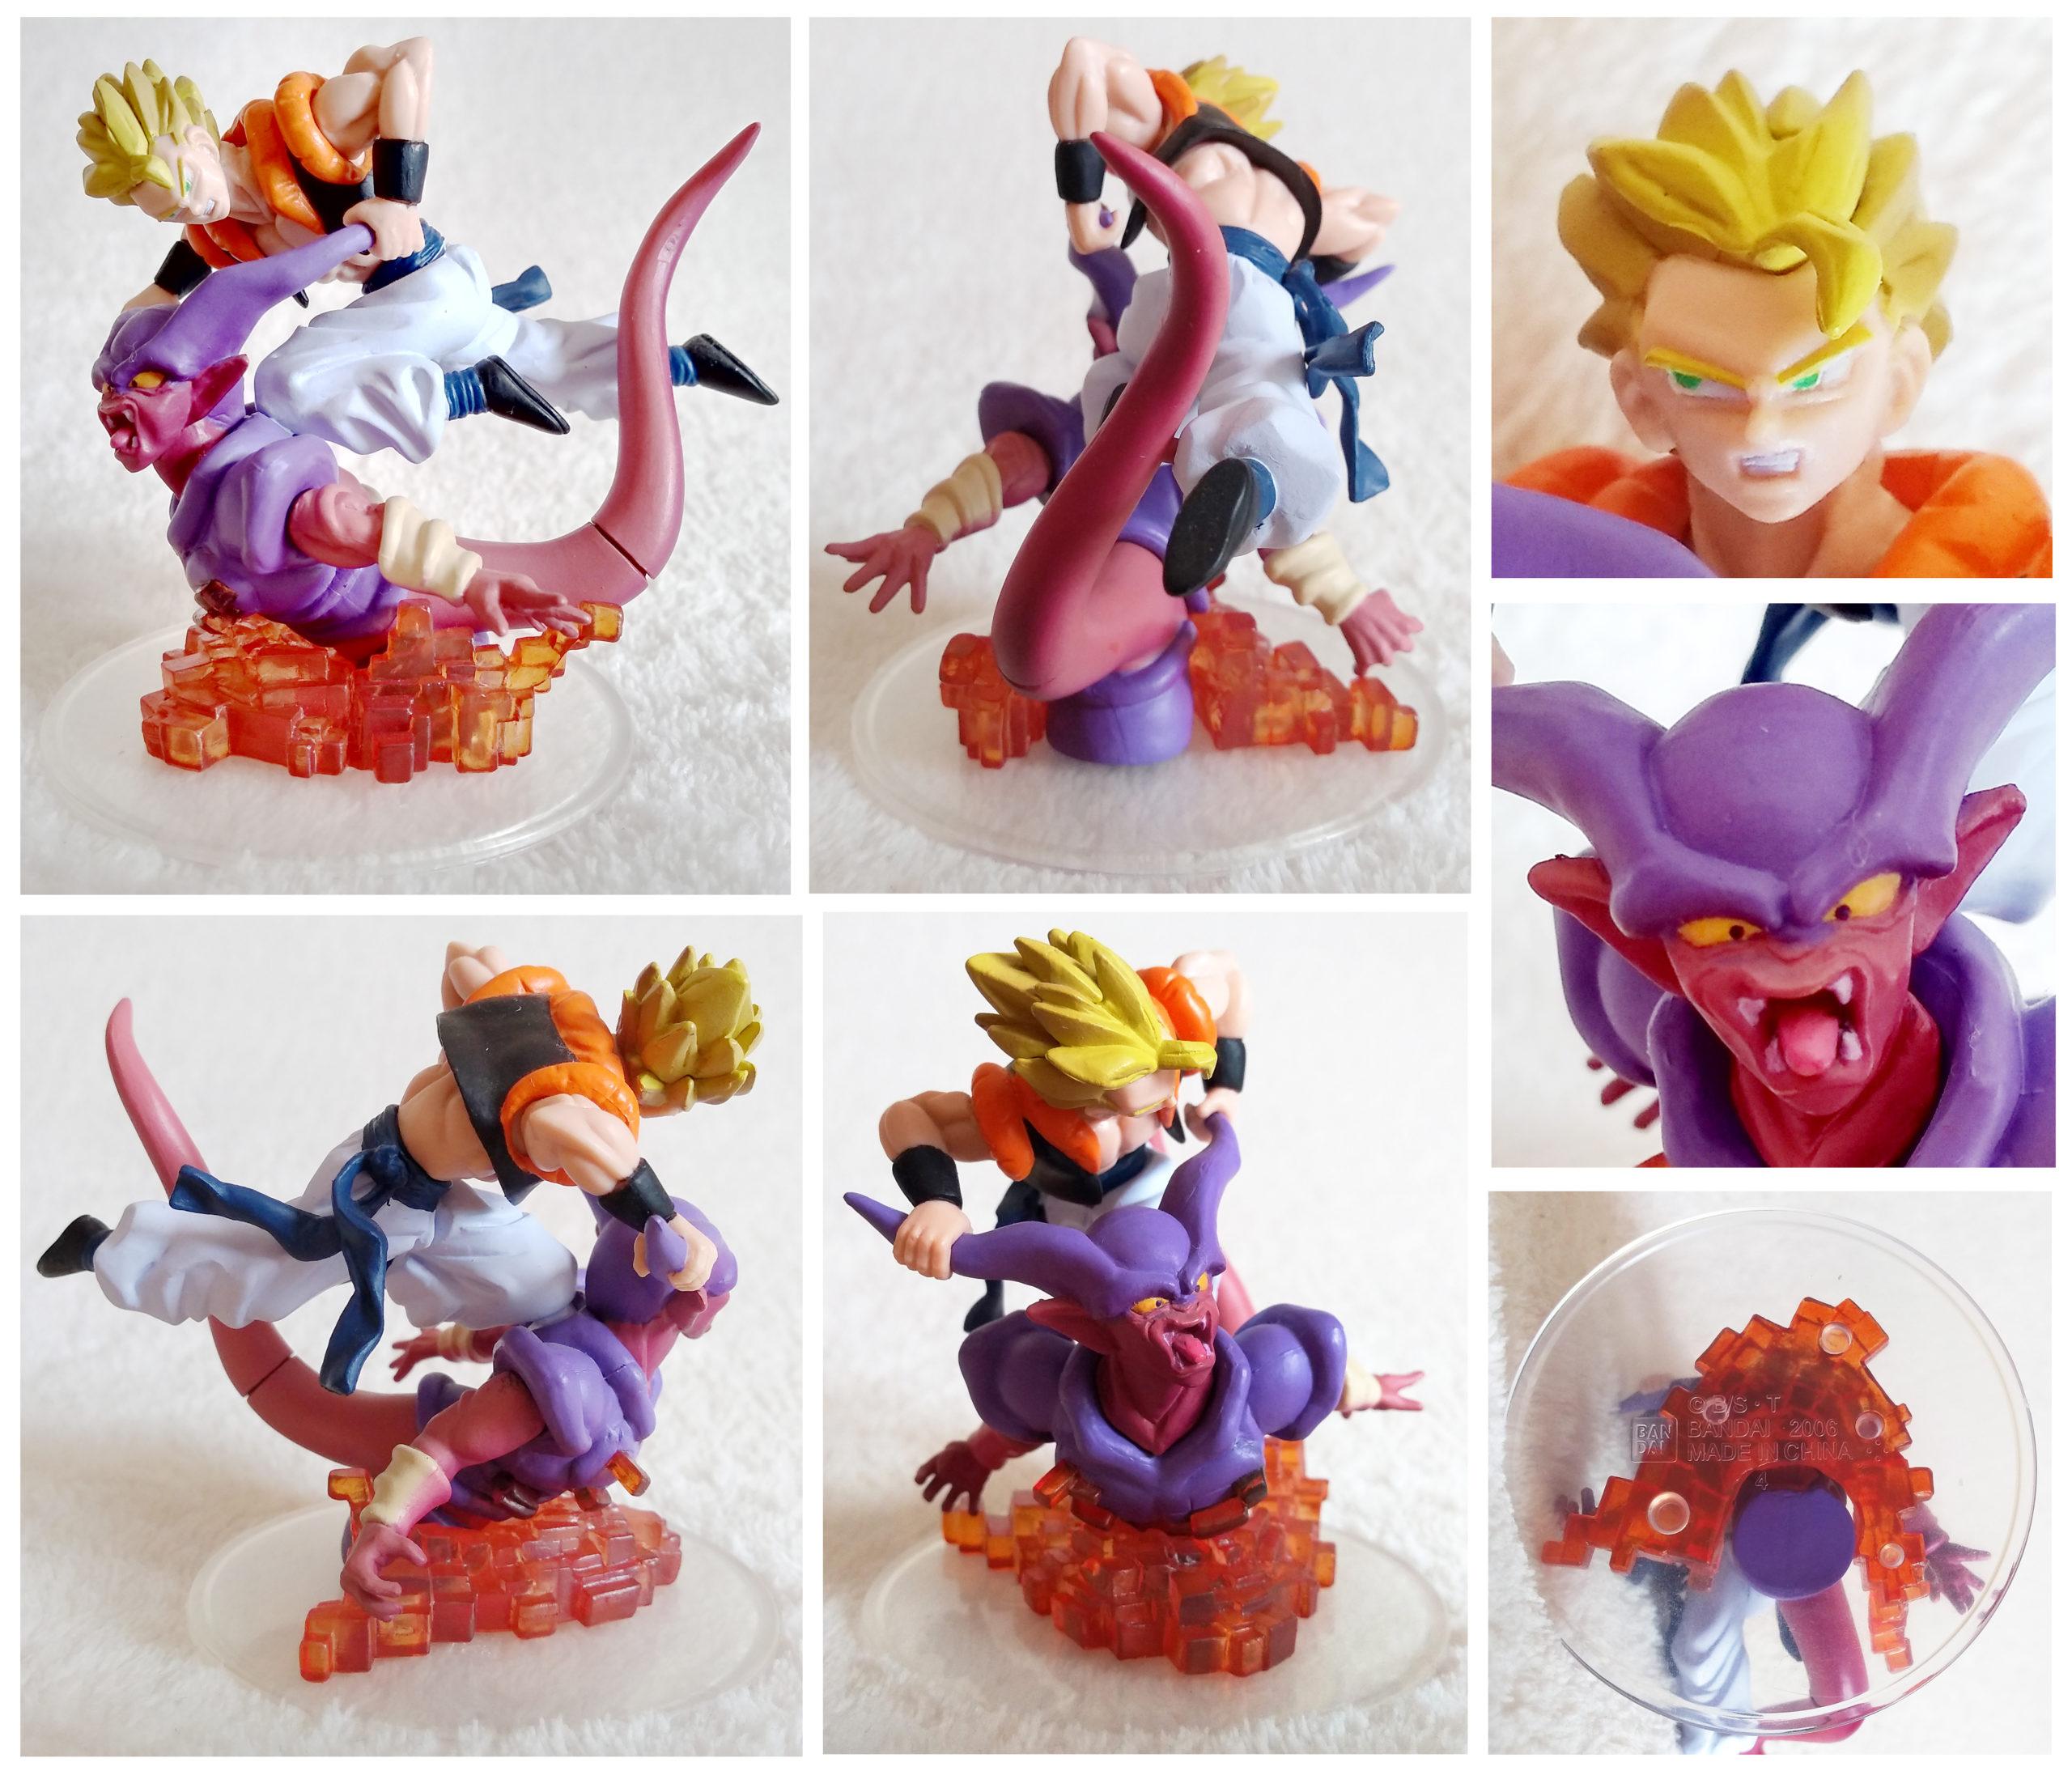 Dragonball Z Imagination Figure Vol. 8 by Bandai Gogeta VS Janemba